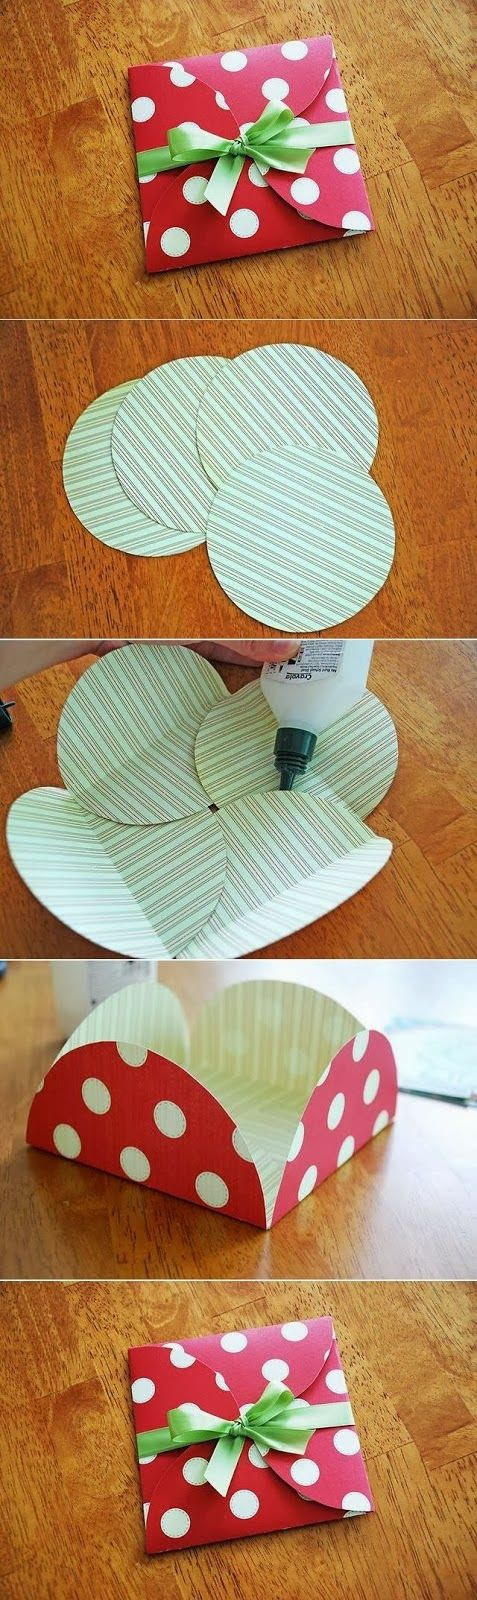 Make a Simple Beautiful Envelope